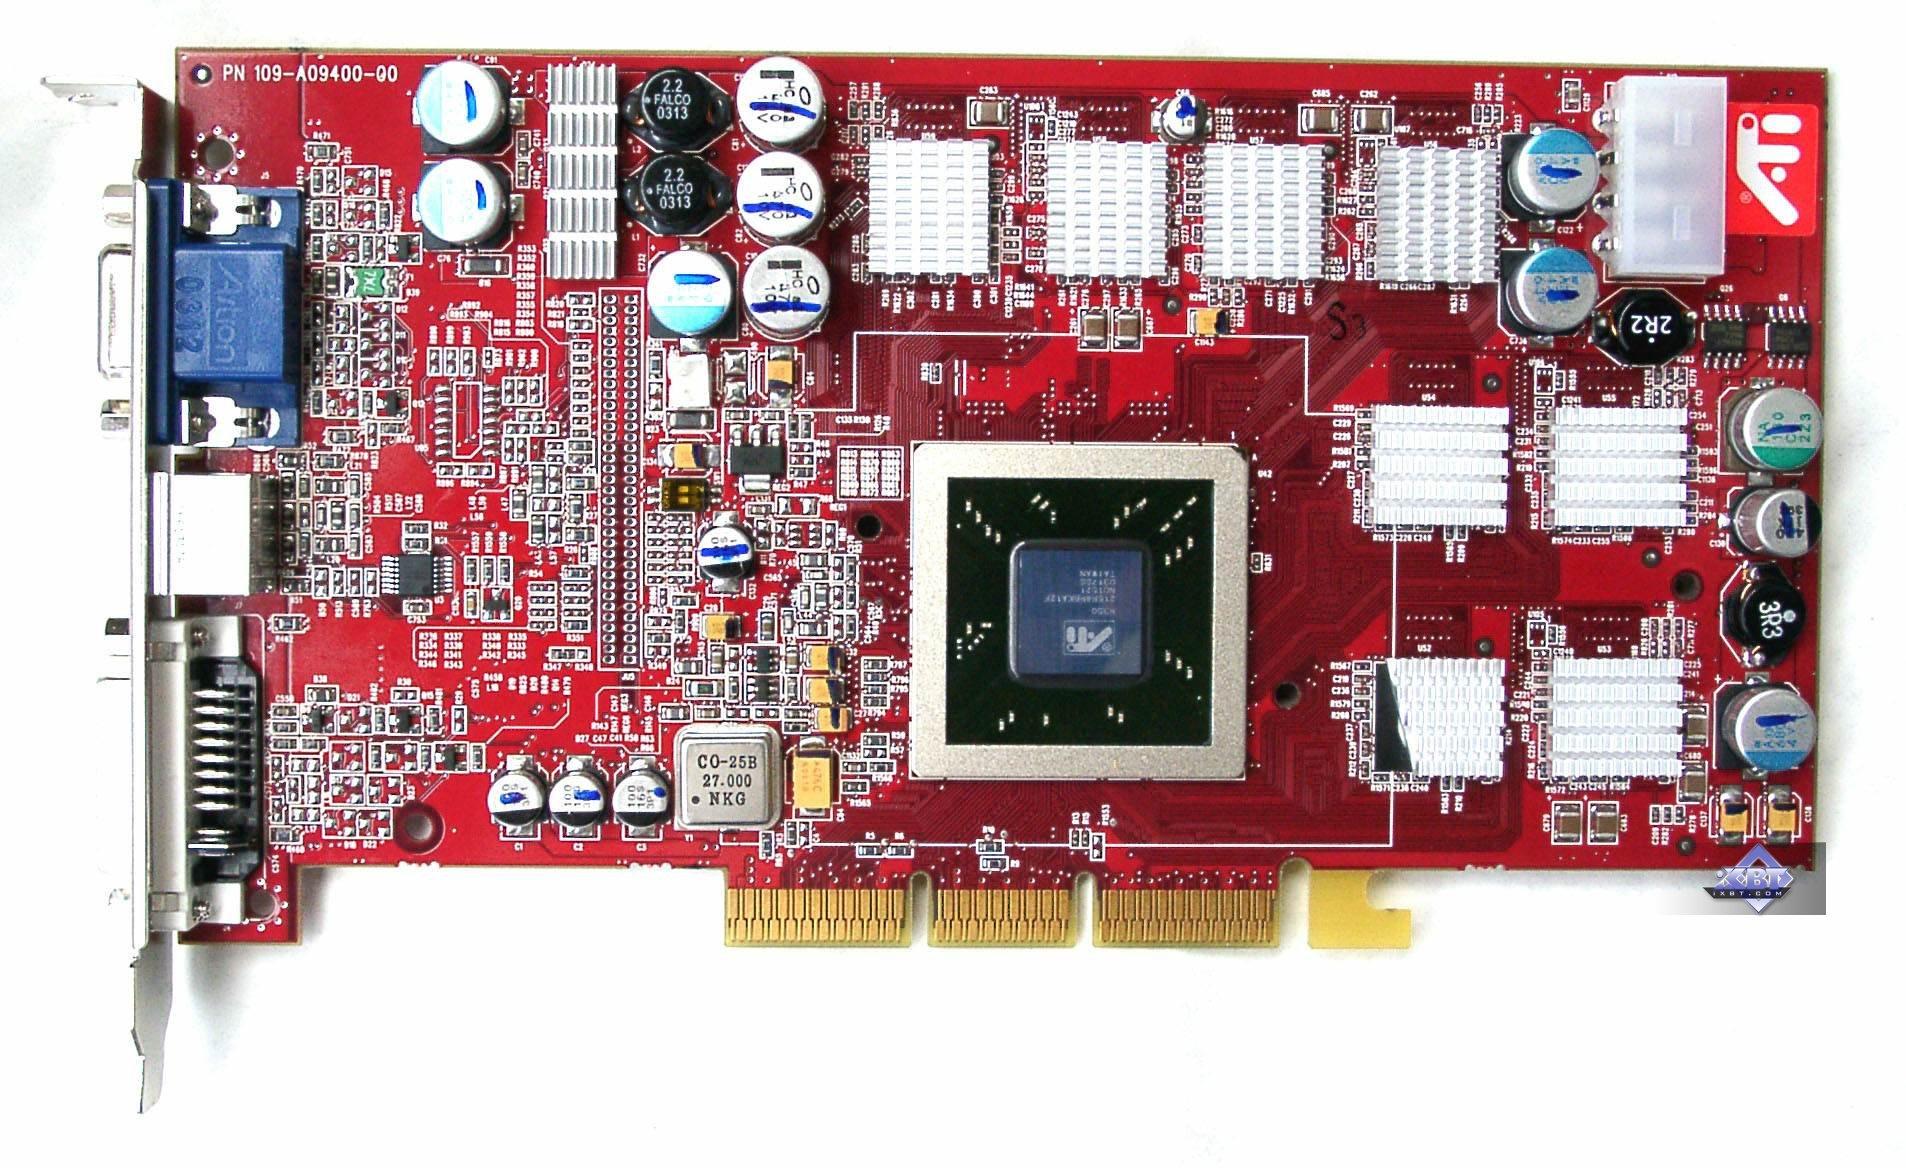 Reference Card ATI RADEON 9800 PRO